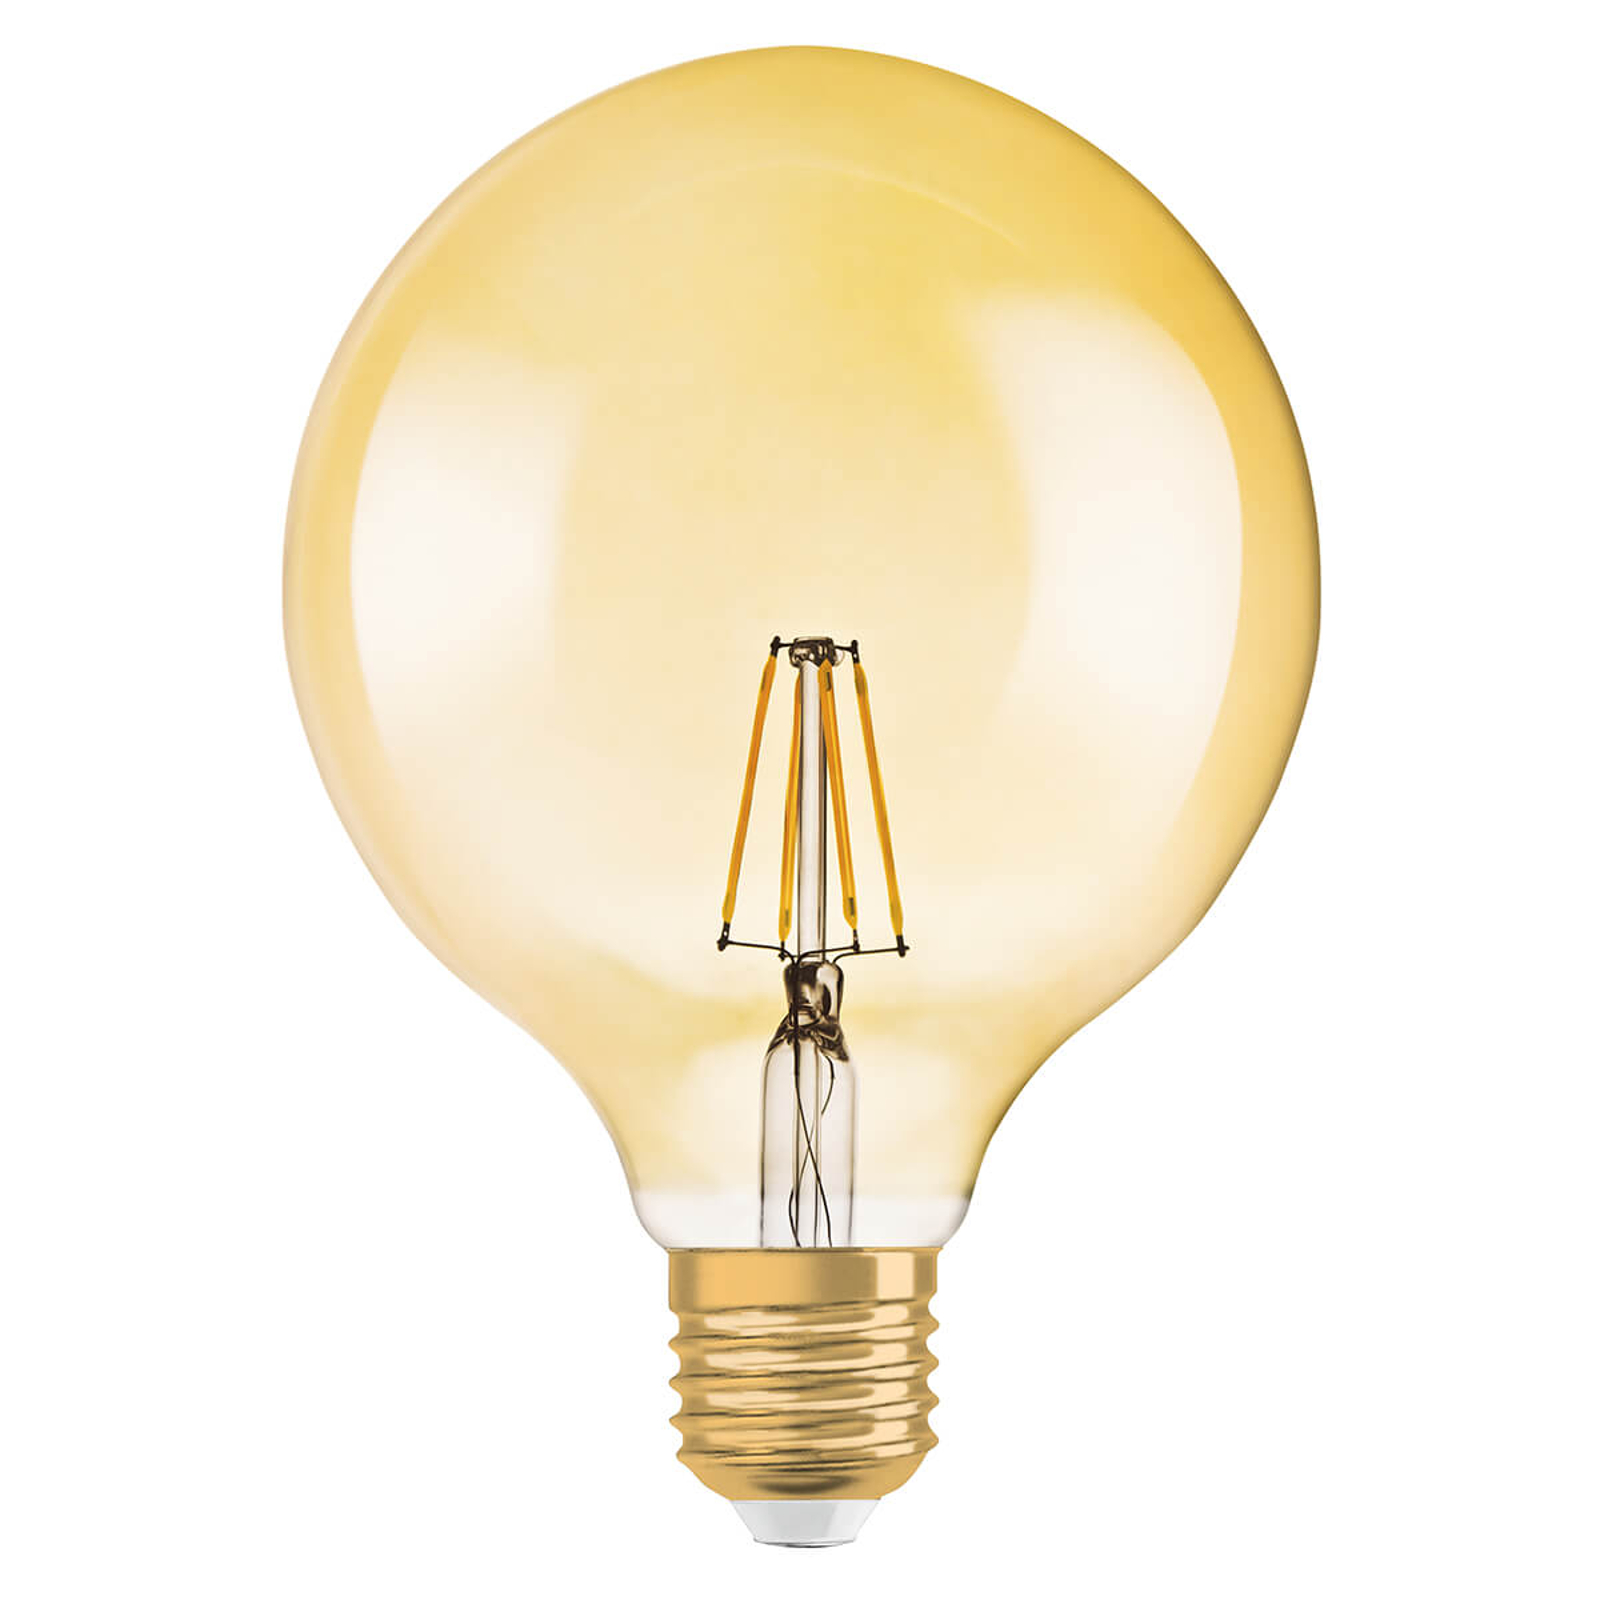 Żarówka kulista LED Gold E27 2,5W, 220 lumenów